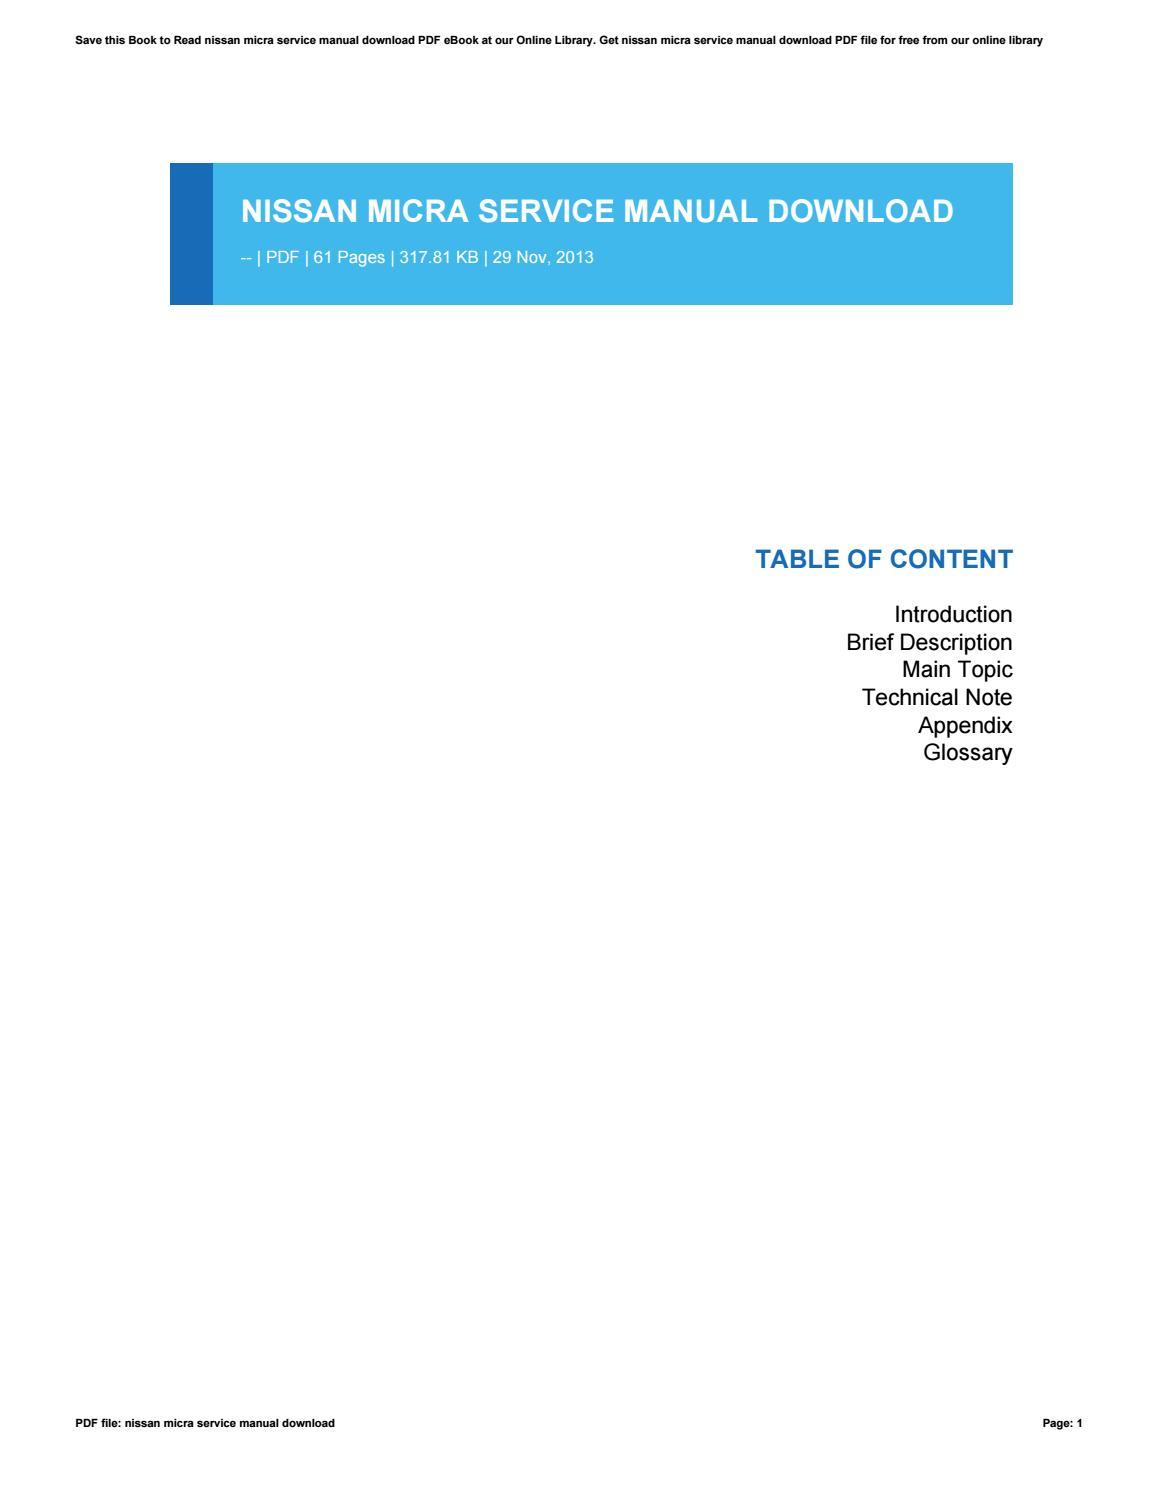 nissan micra service manual downloadsabir54renata - issuu